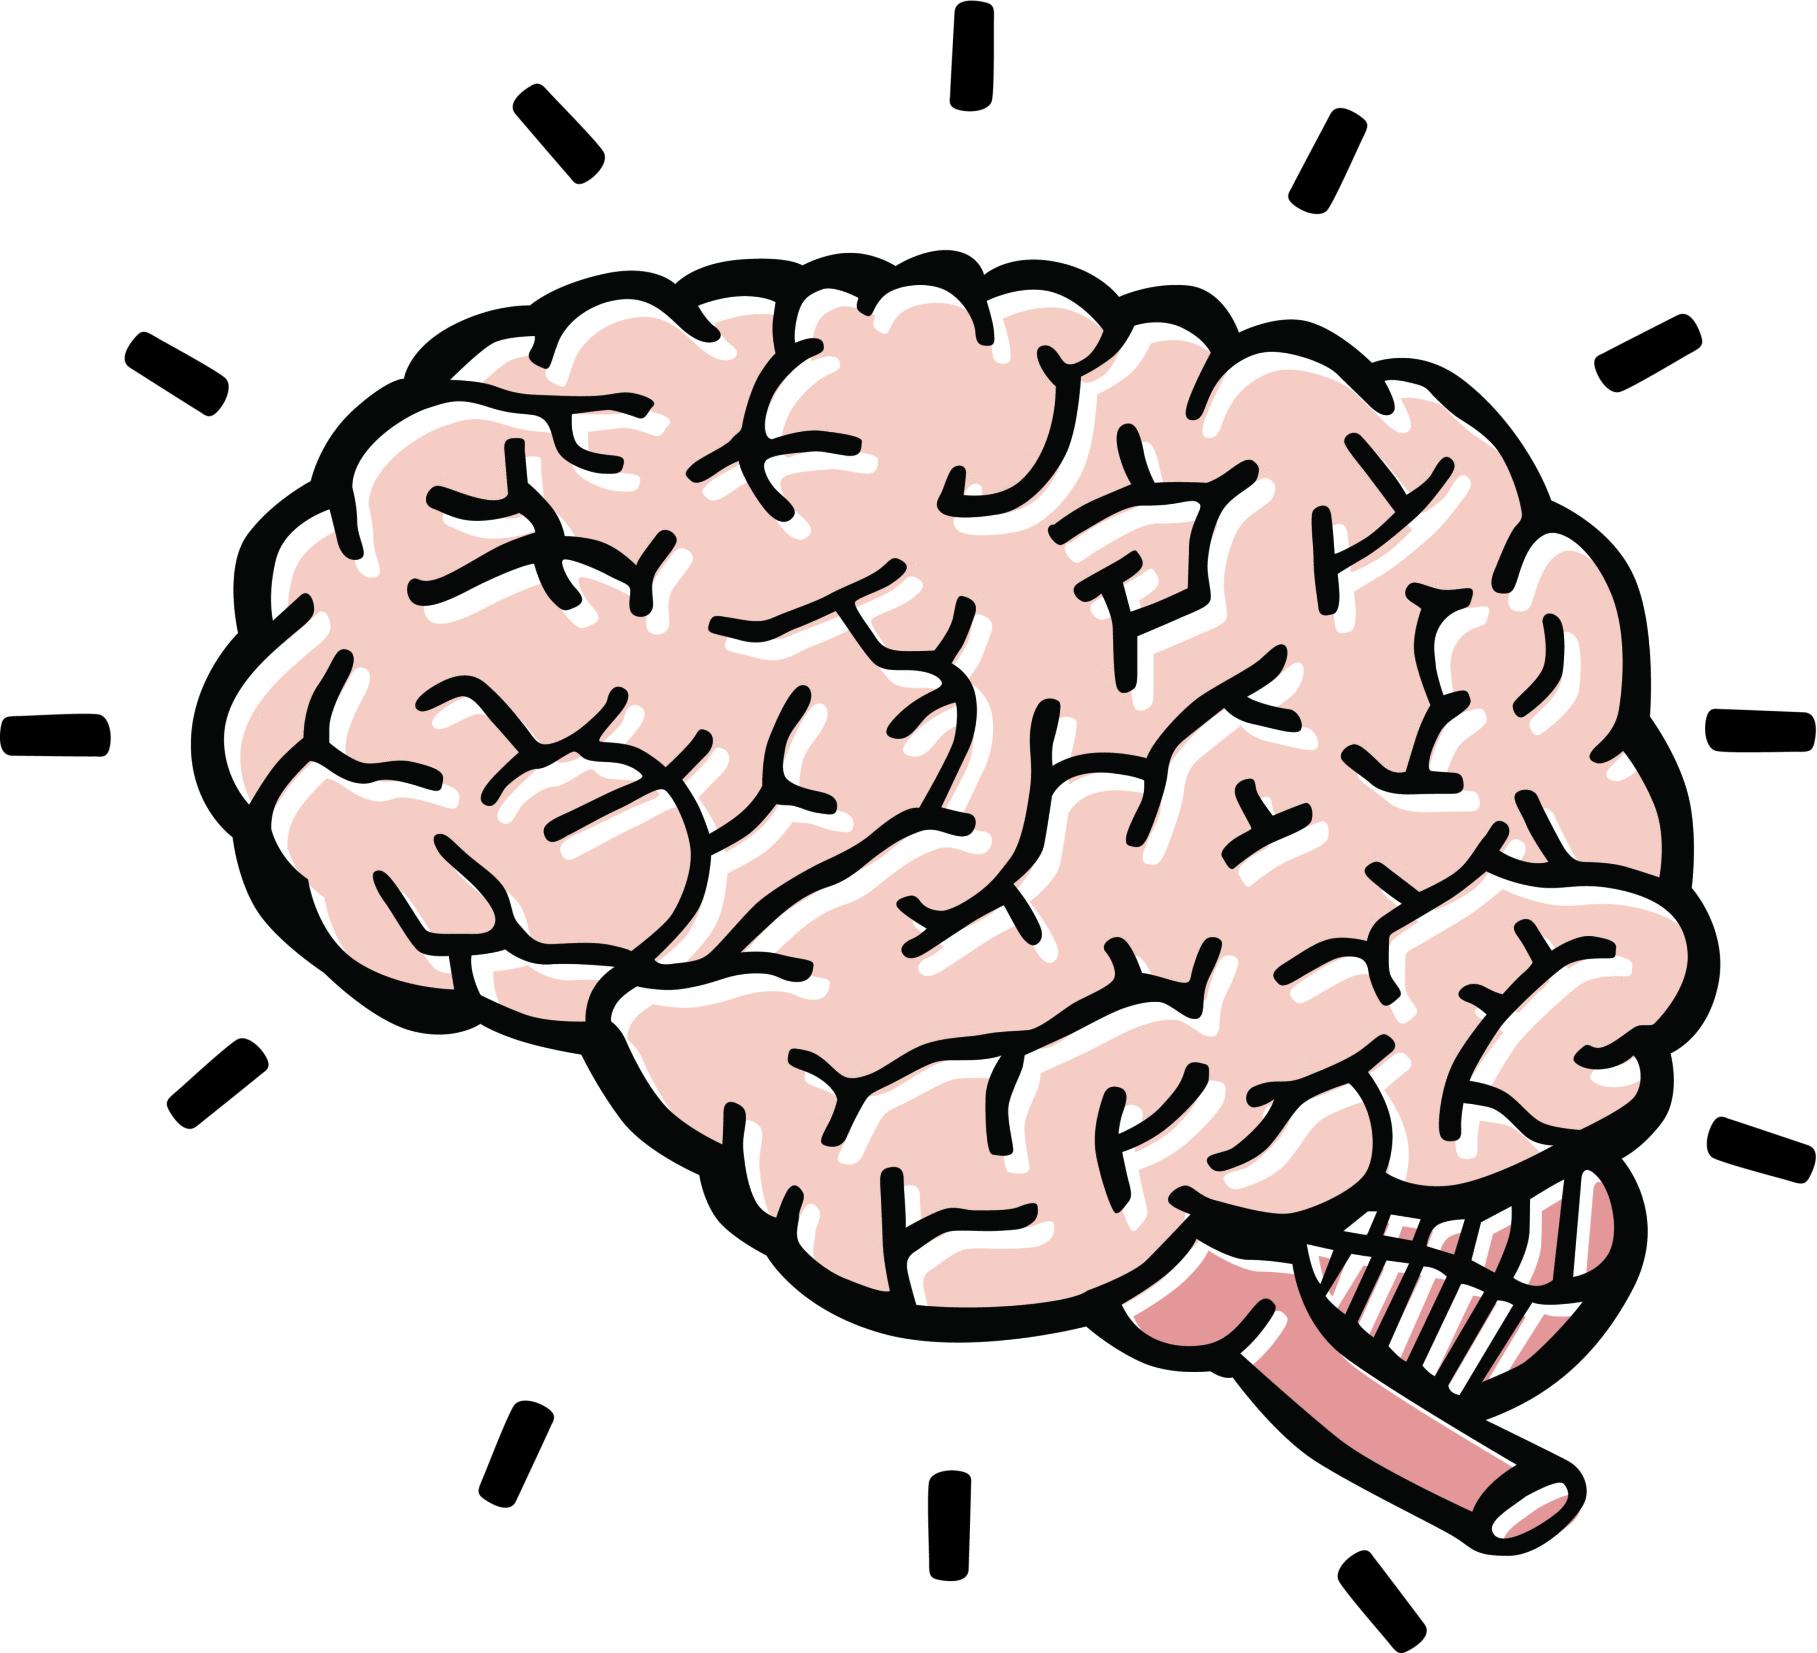 Gears clipart smart brain Clip Brain Gears Clipart Brain